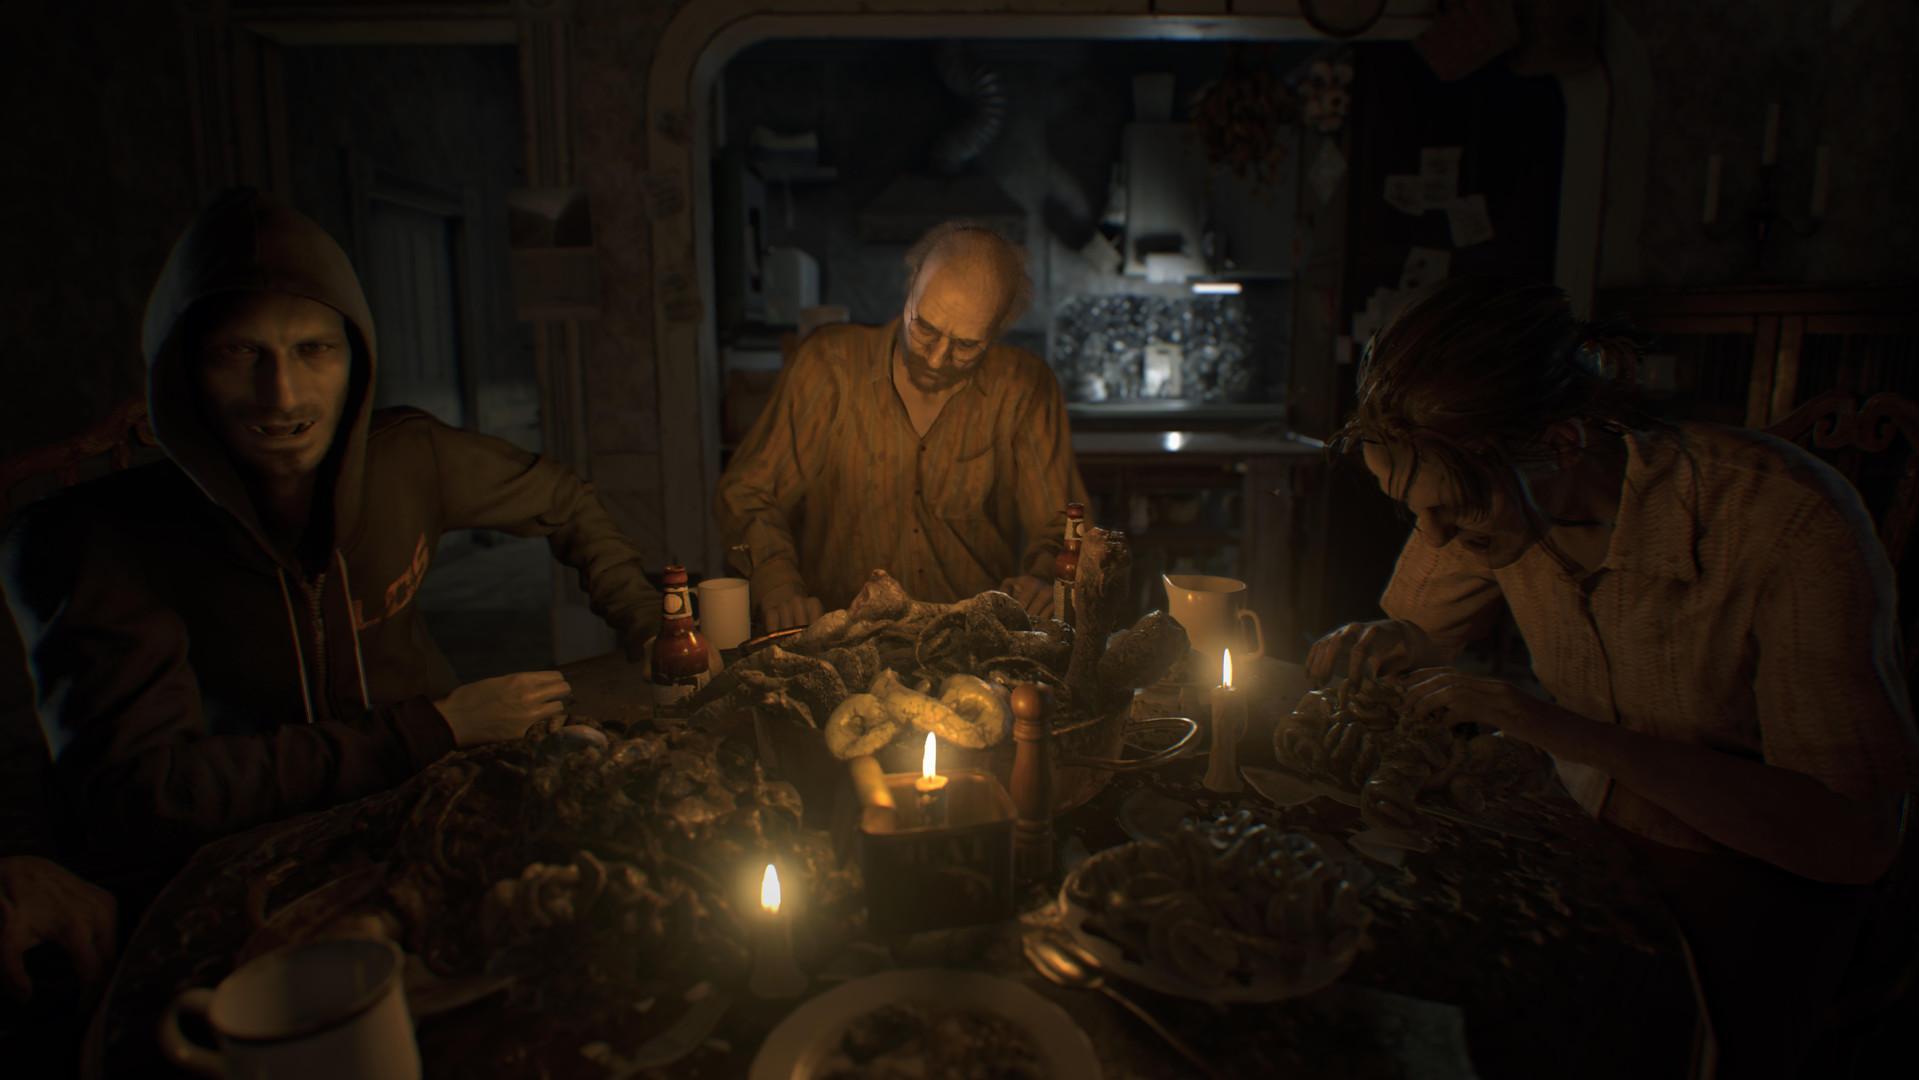 Resident Evil 7: Biohazard - Gold Edition (RUS|ENG|MULTI13) [RePack] от R.G. Механики